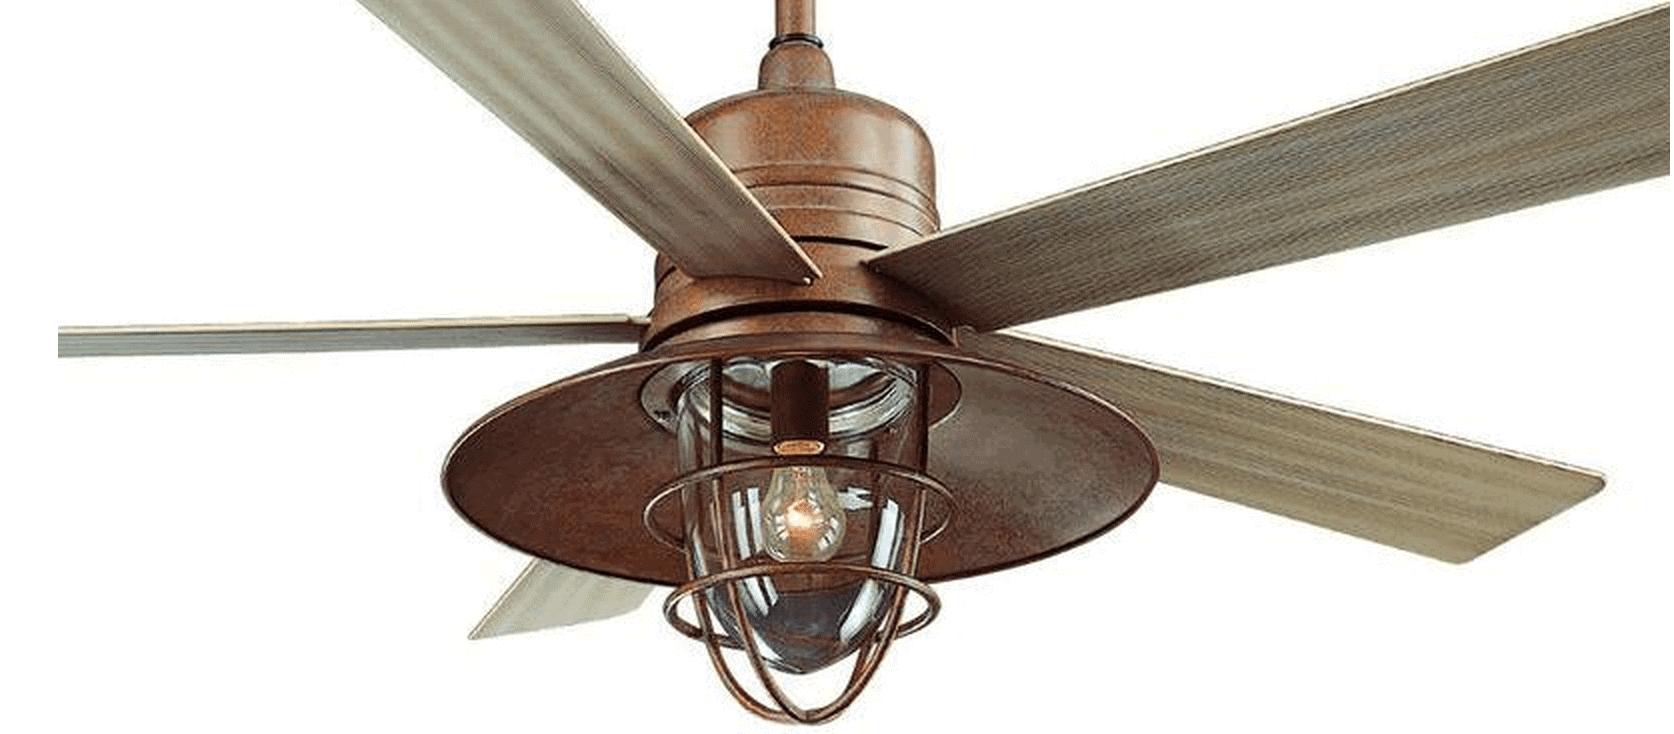 10 stylish non boring ceiling fans 10 stylish non boring ceiling fans blesser house arubaitofo Choice Image